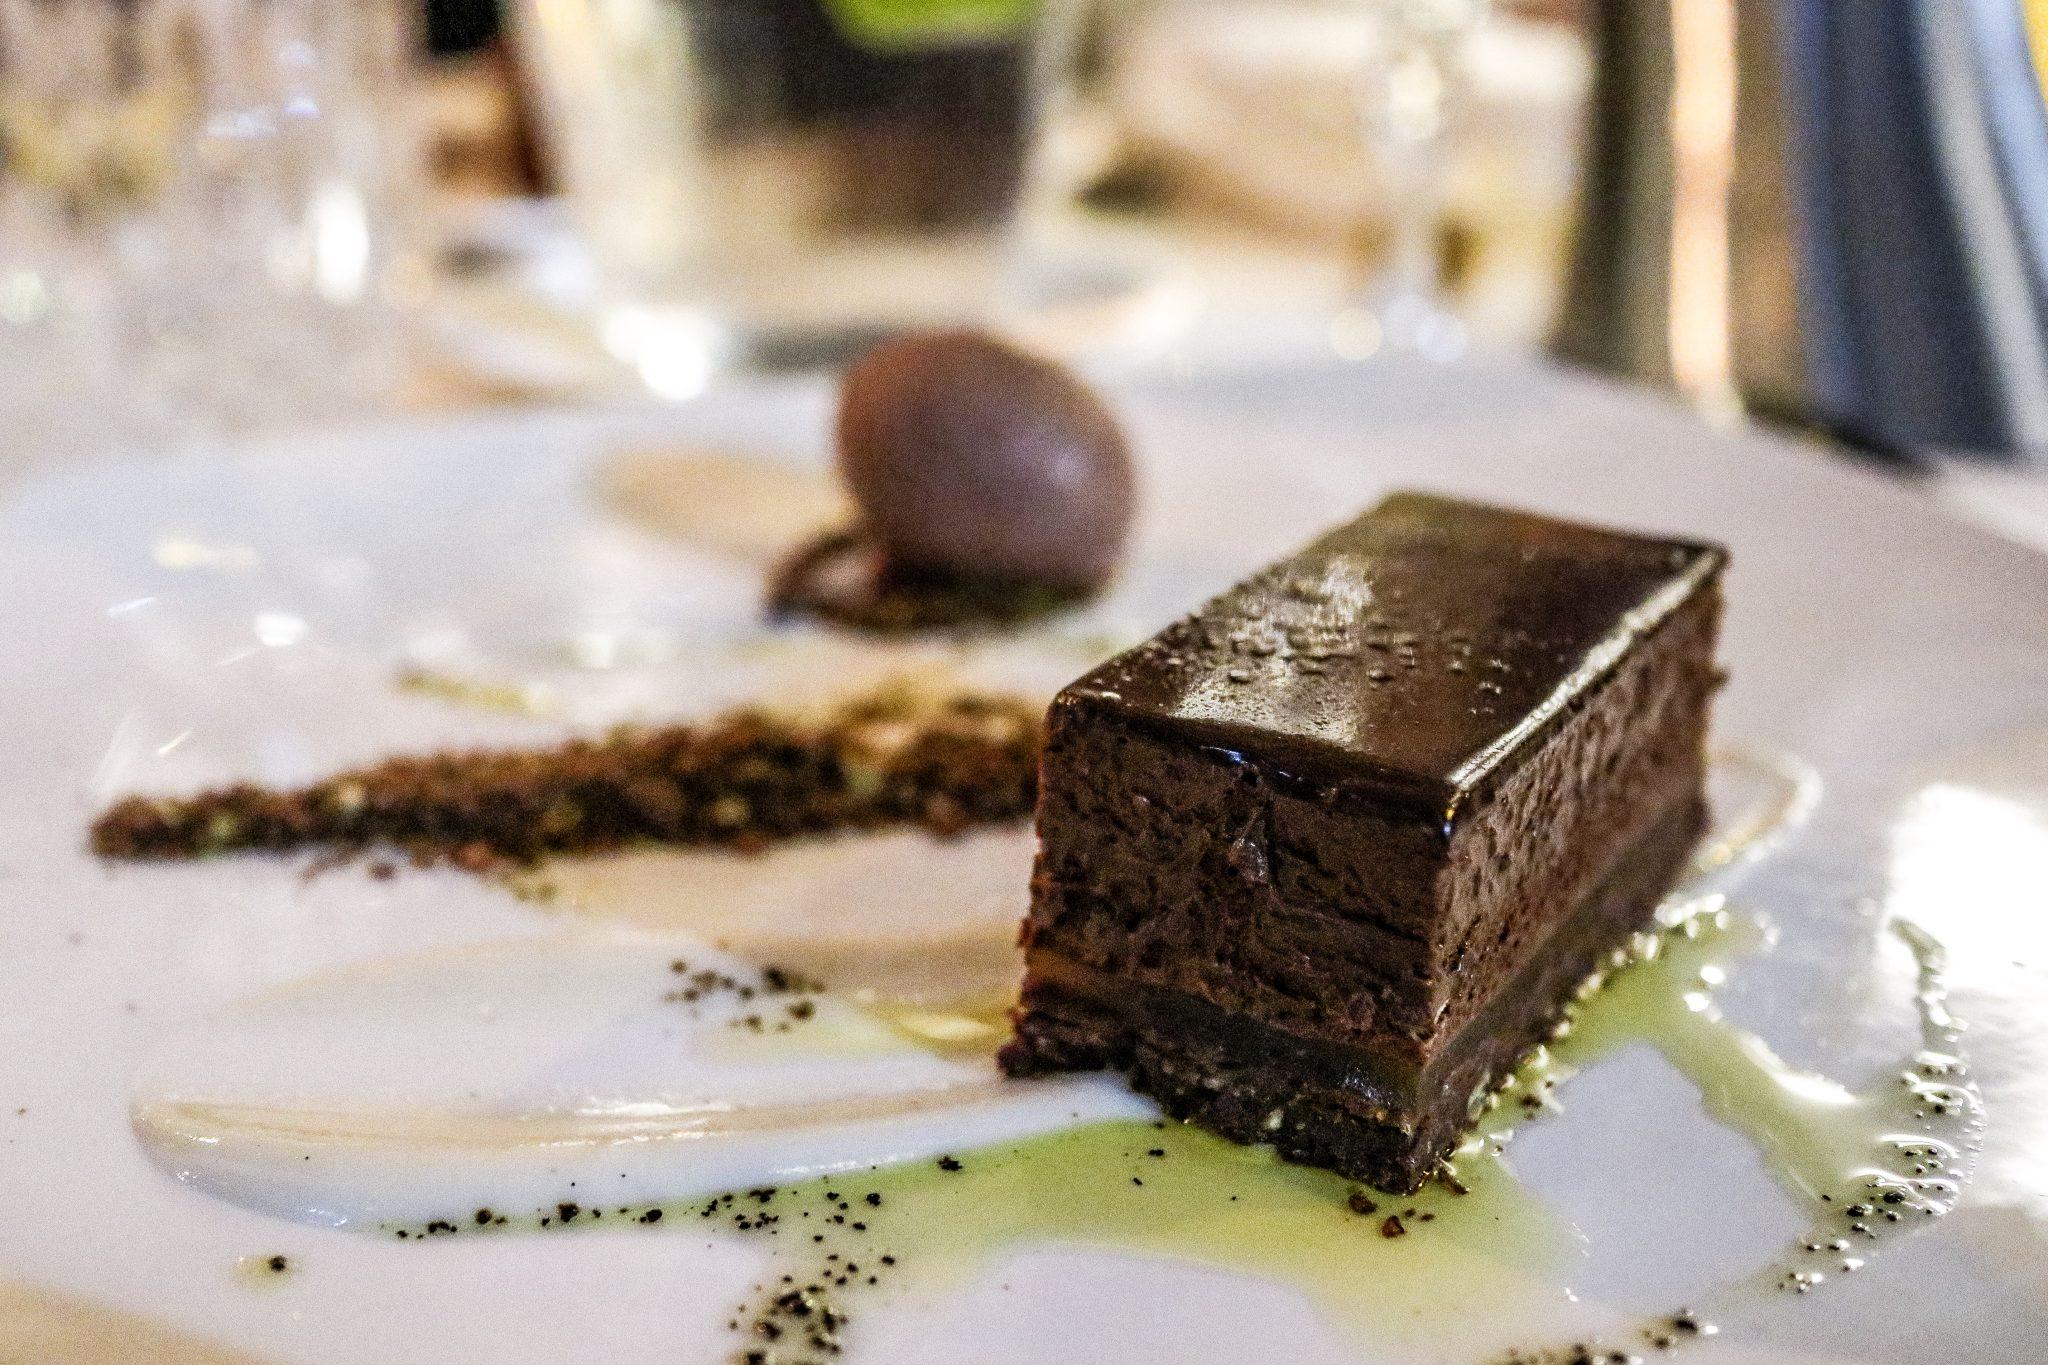 Chocolate burnt citrus pave with milk puree & espresso olive oil